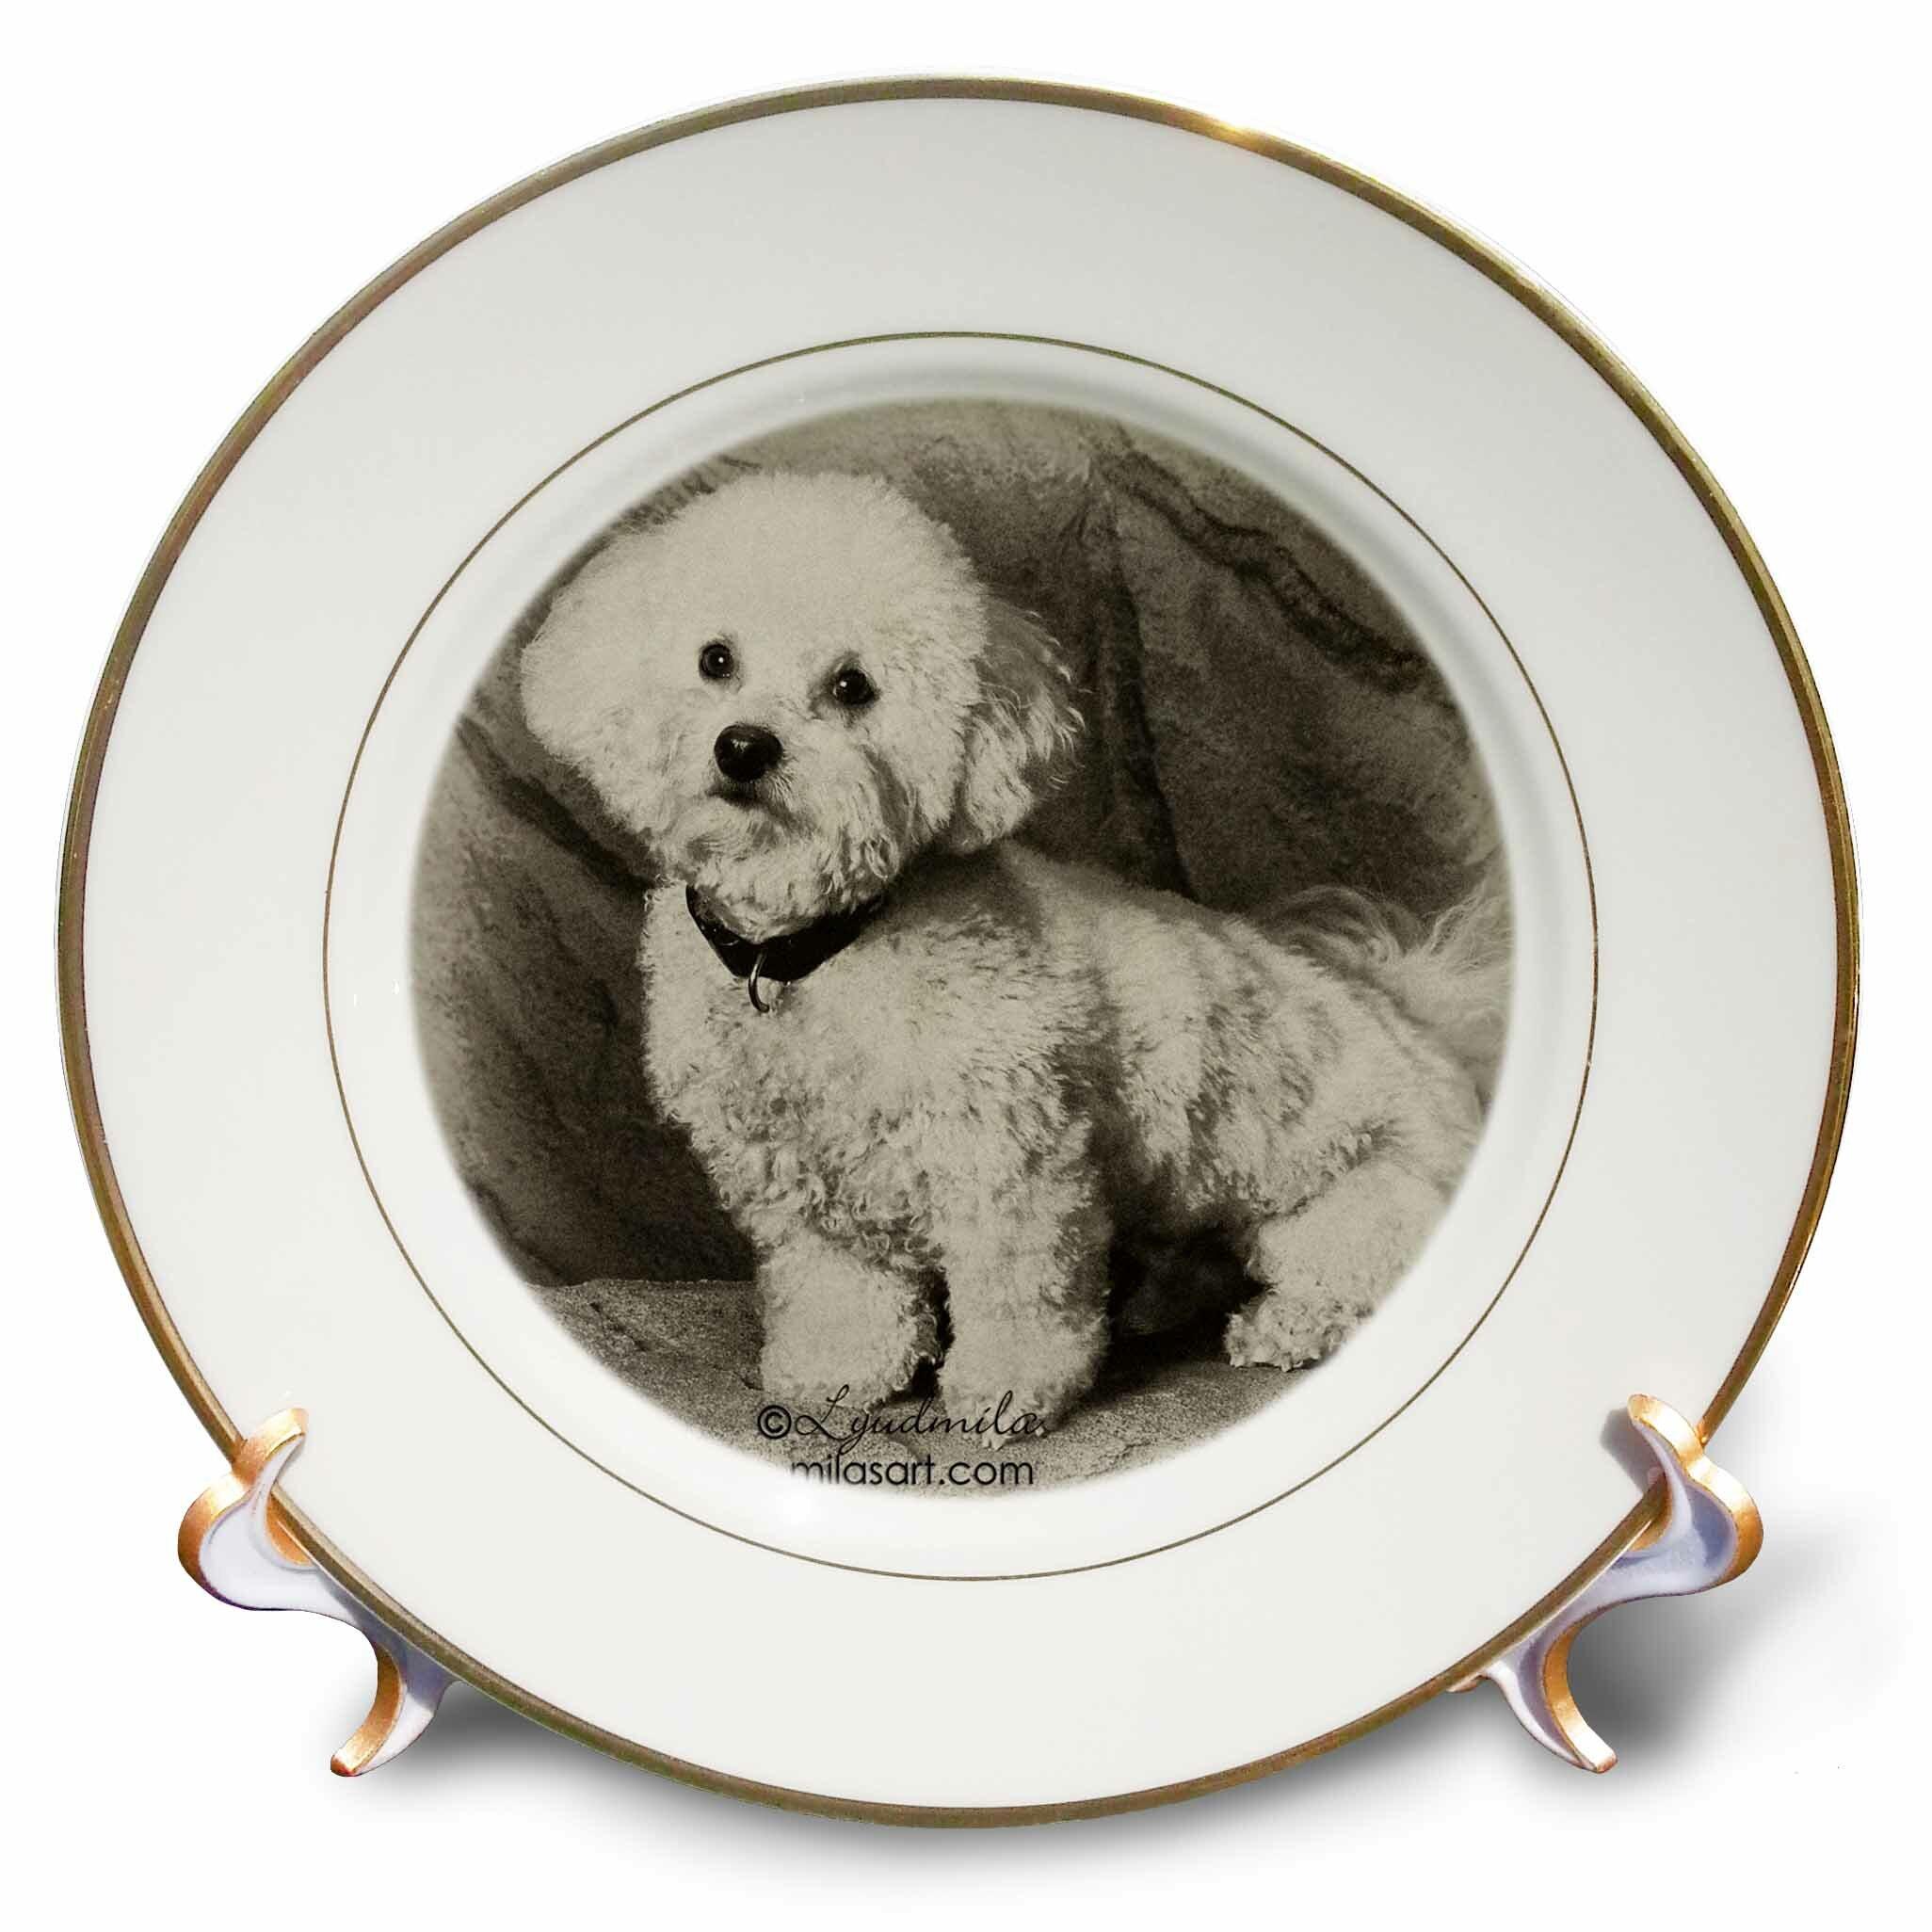 East Urban Home Bichon Frise Porcelain Decorative Plate Wayfair